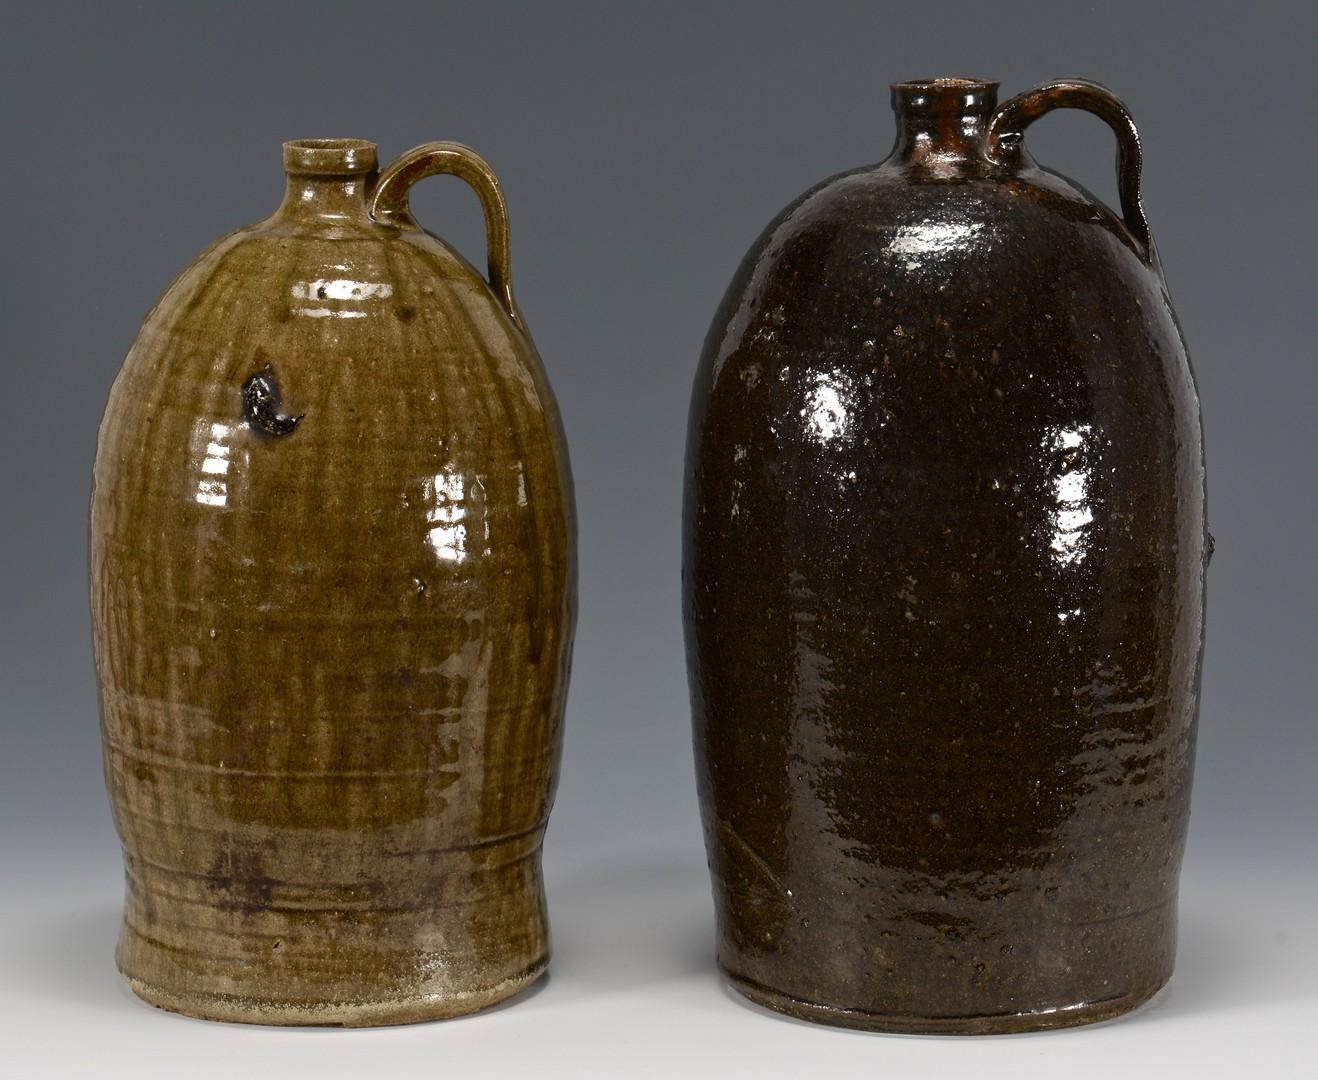 Lot 147: 2 Southern Alkaline Glaze Stoneware Jugs